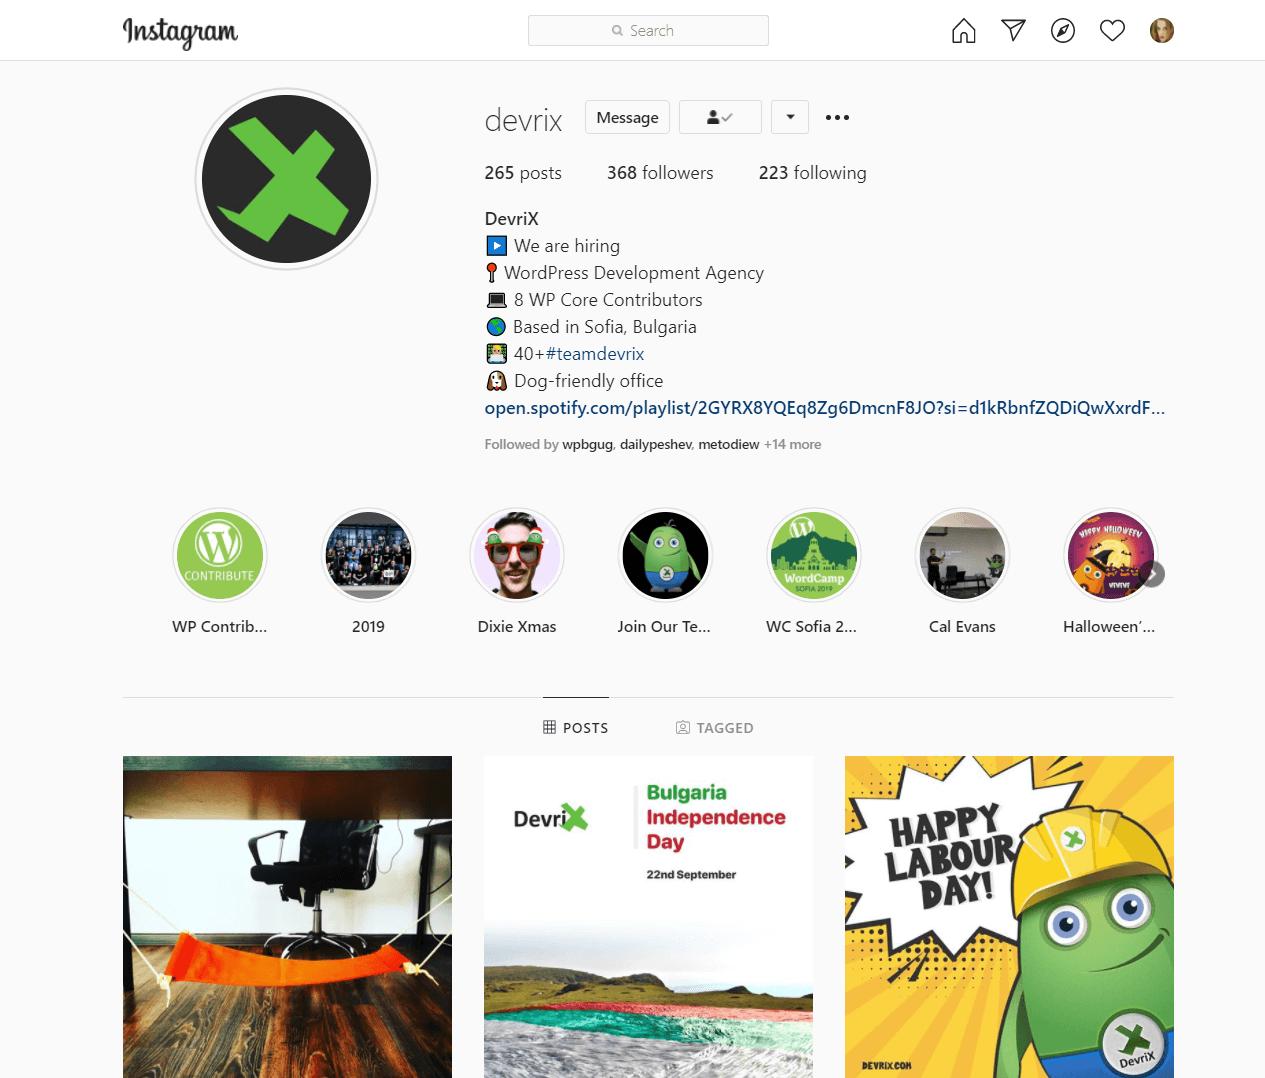 devrix Instagram profile